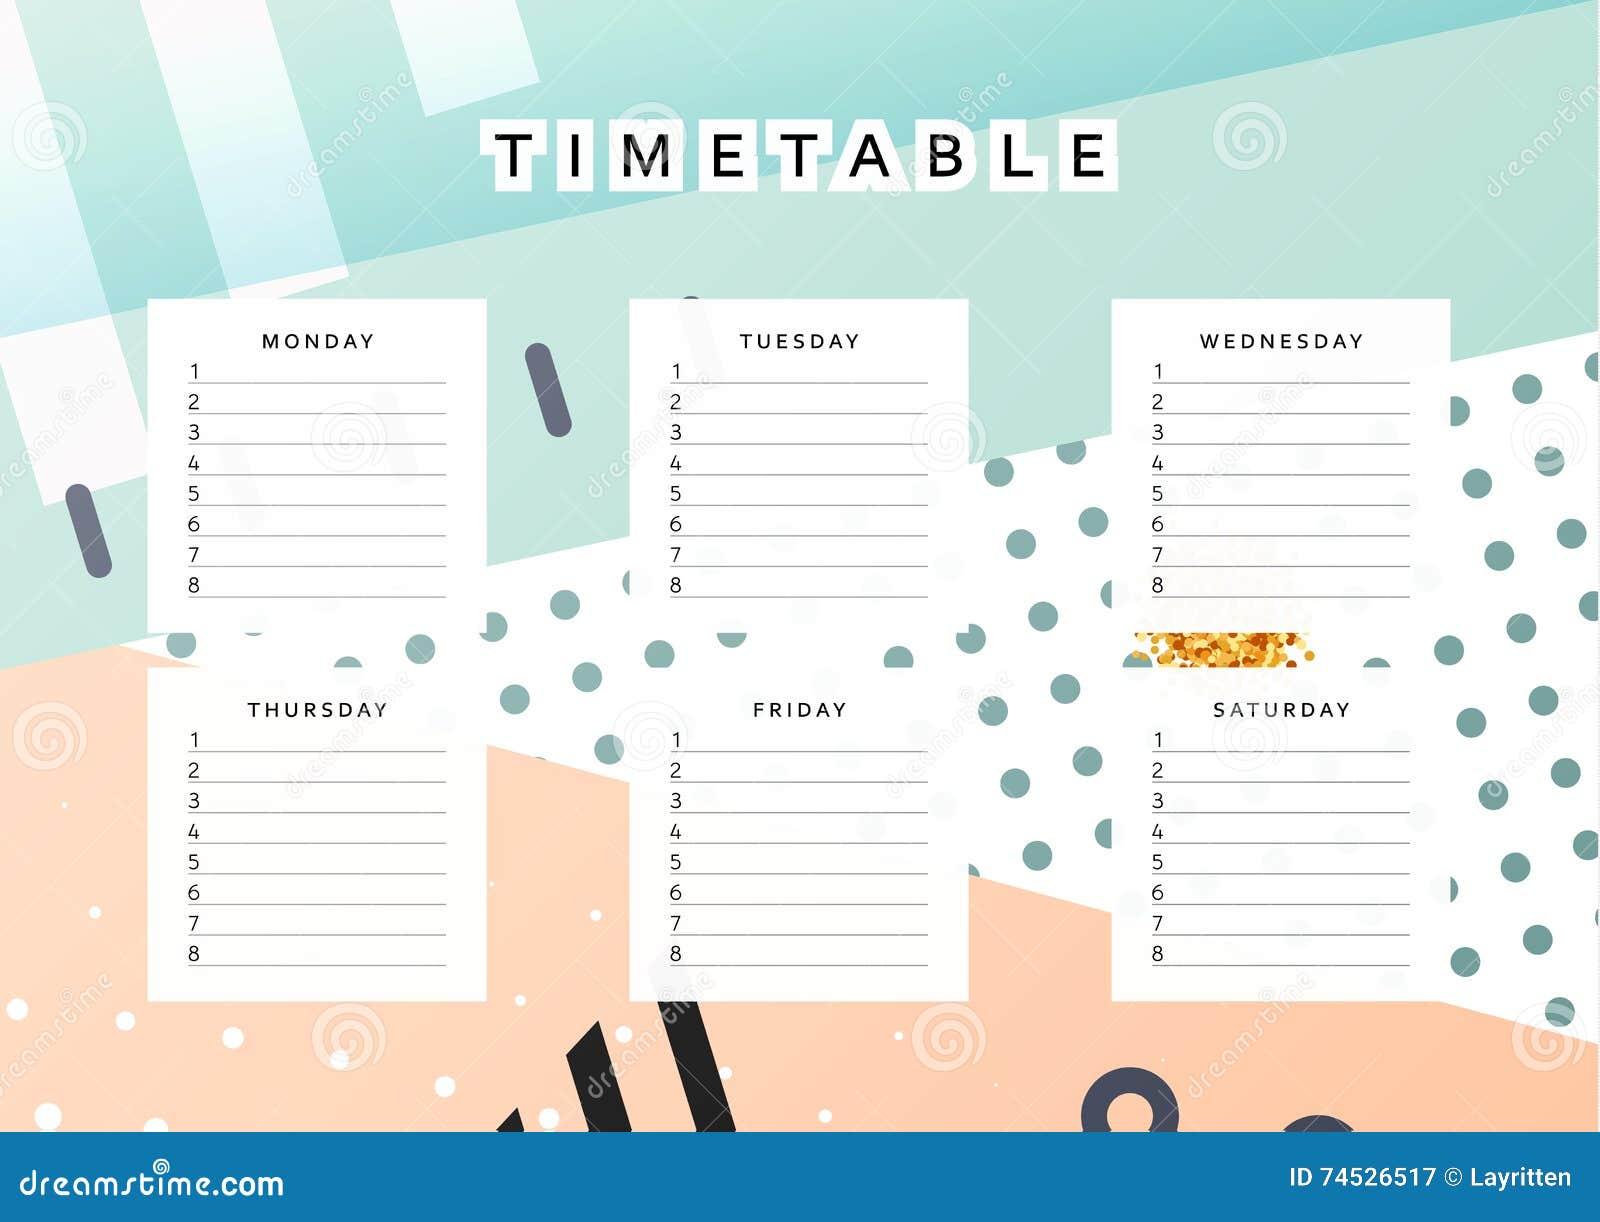 Planner Calendar Schedule The Week Abstract Design Background Stock Vector Image 74526517